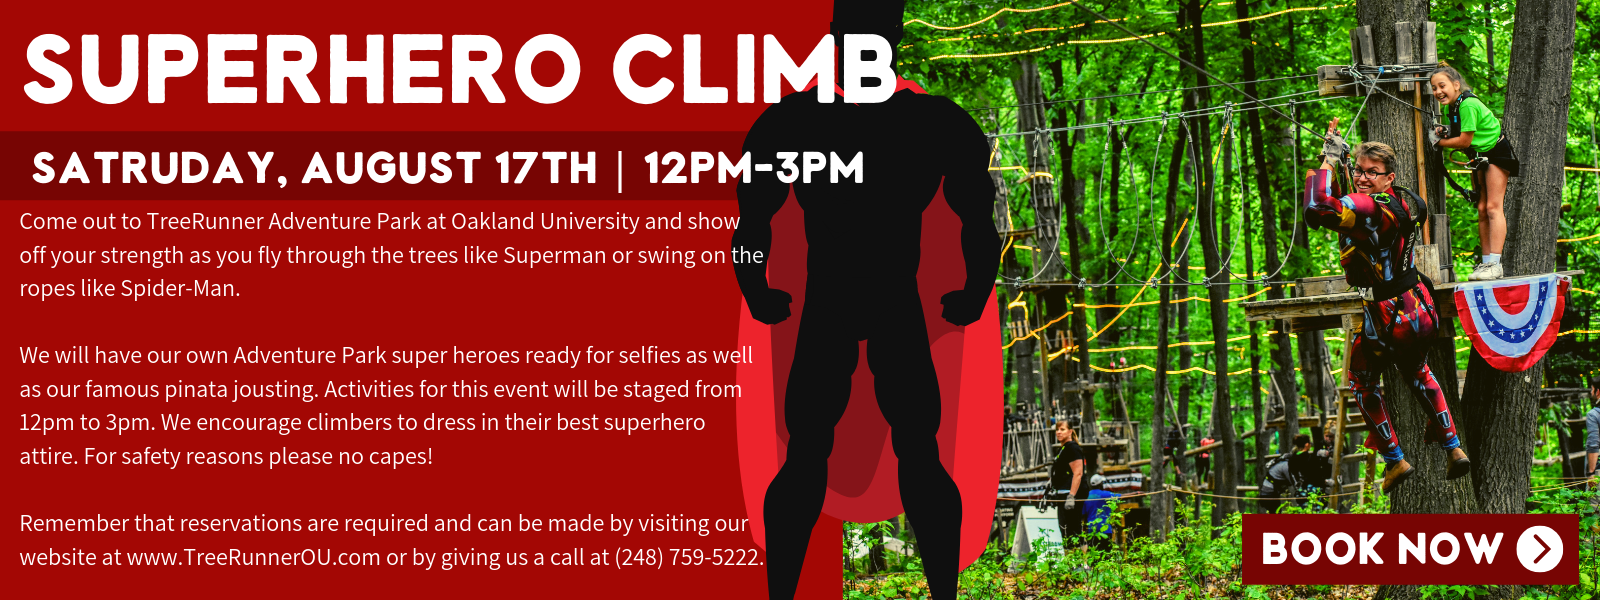 superhero climb